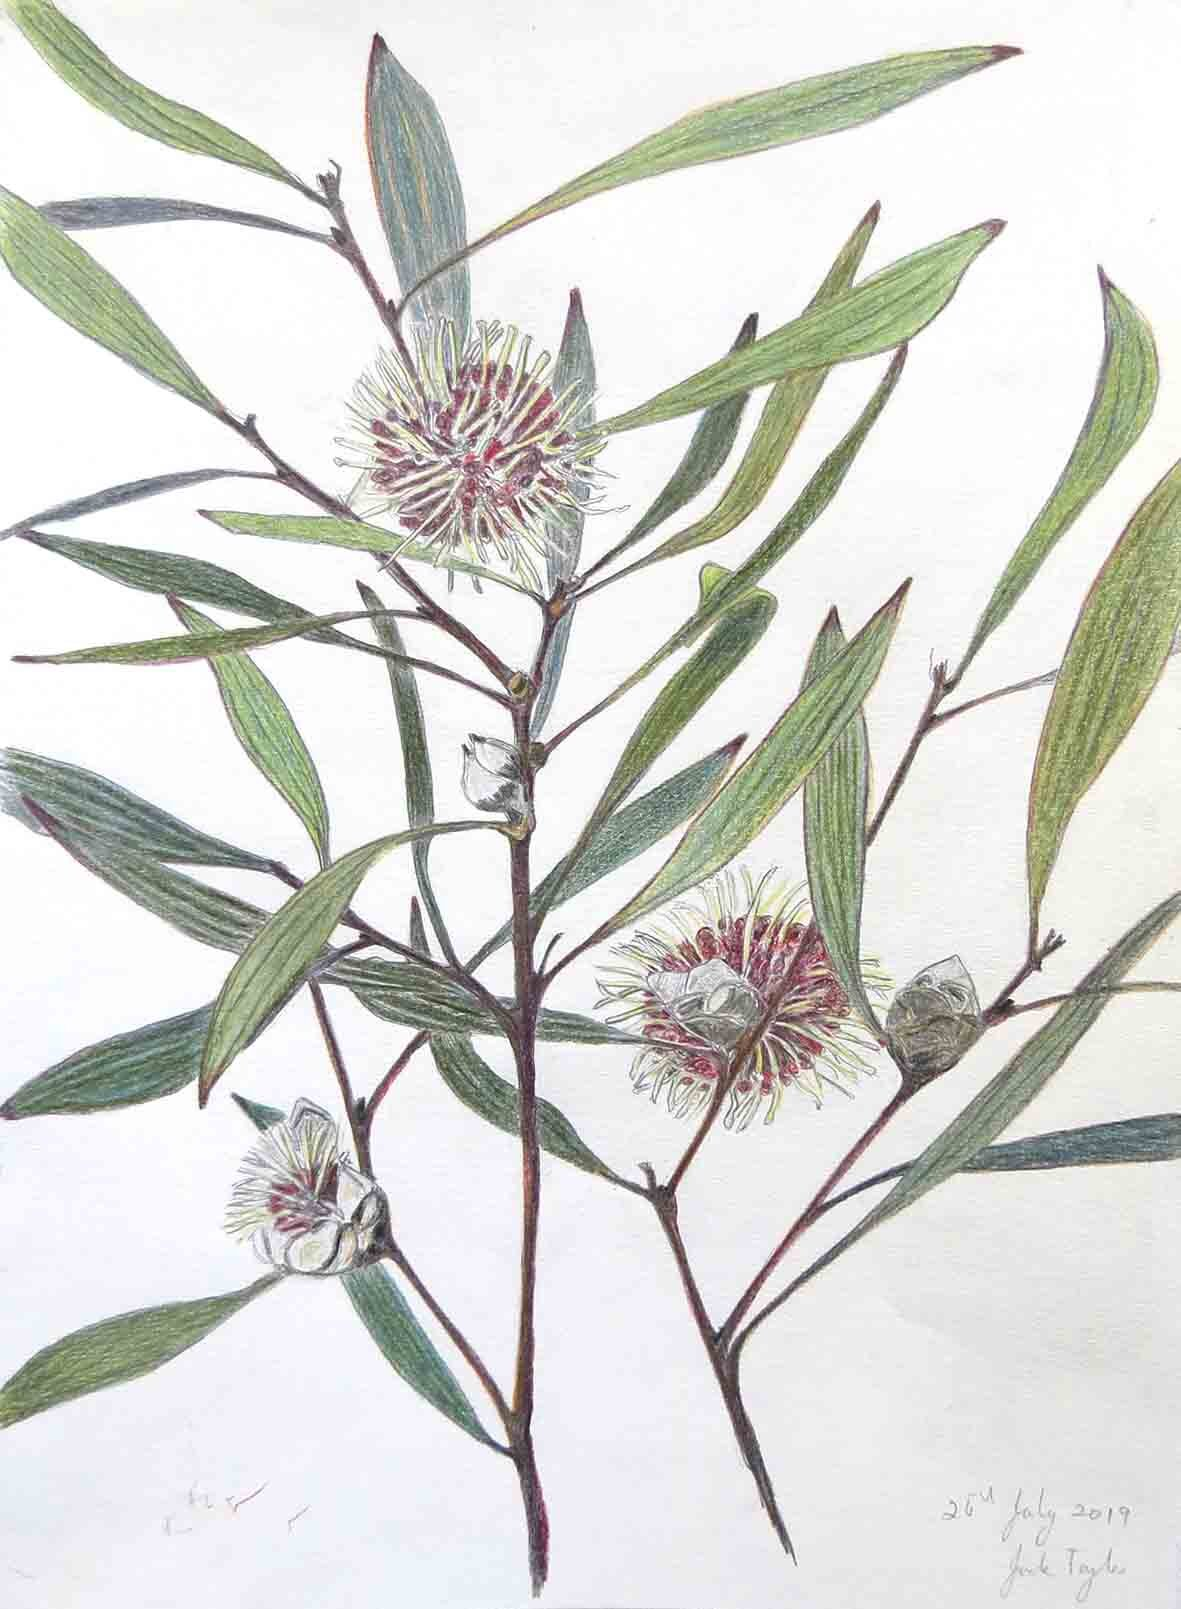 15. Jude Taylor, Pincushion Hakea, 2019, colour pencil on paper, 42 x 30 cm NFS